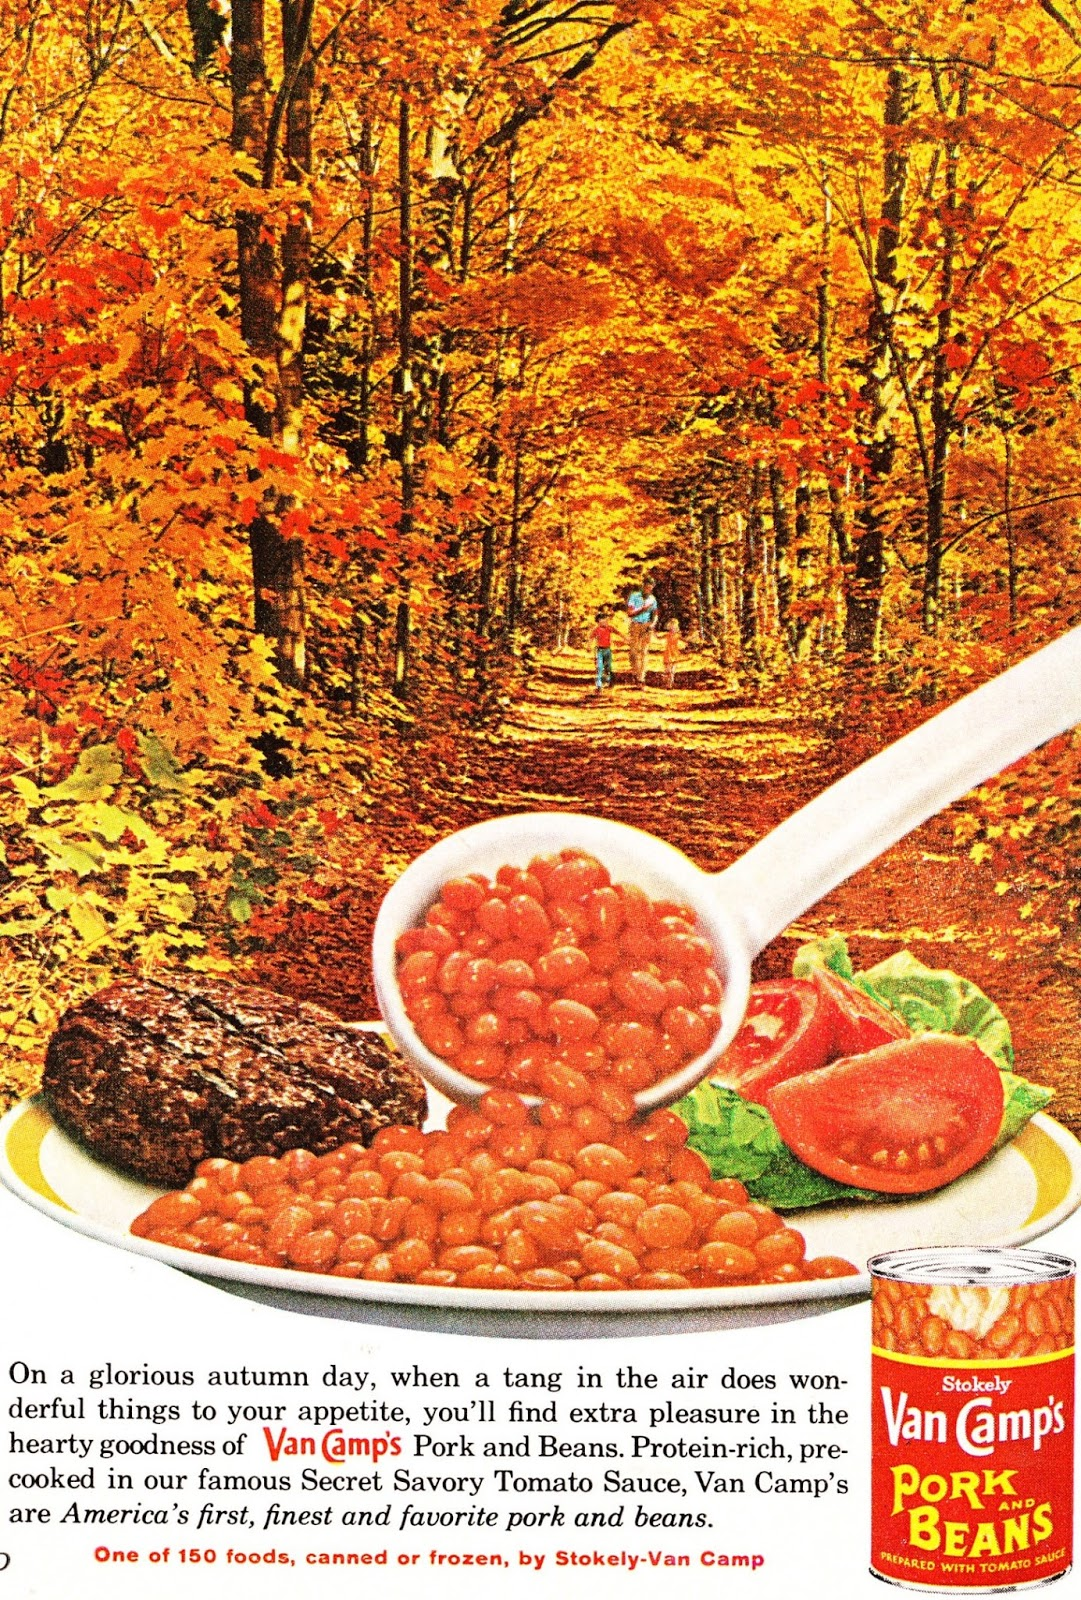 The Retro/Vintage Scan Emporium: Vintage food ads